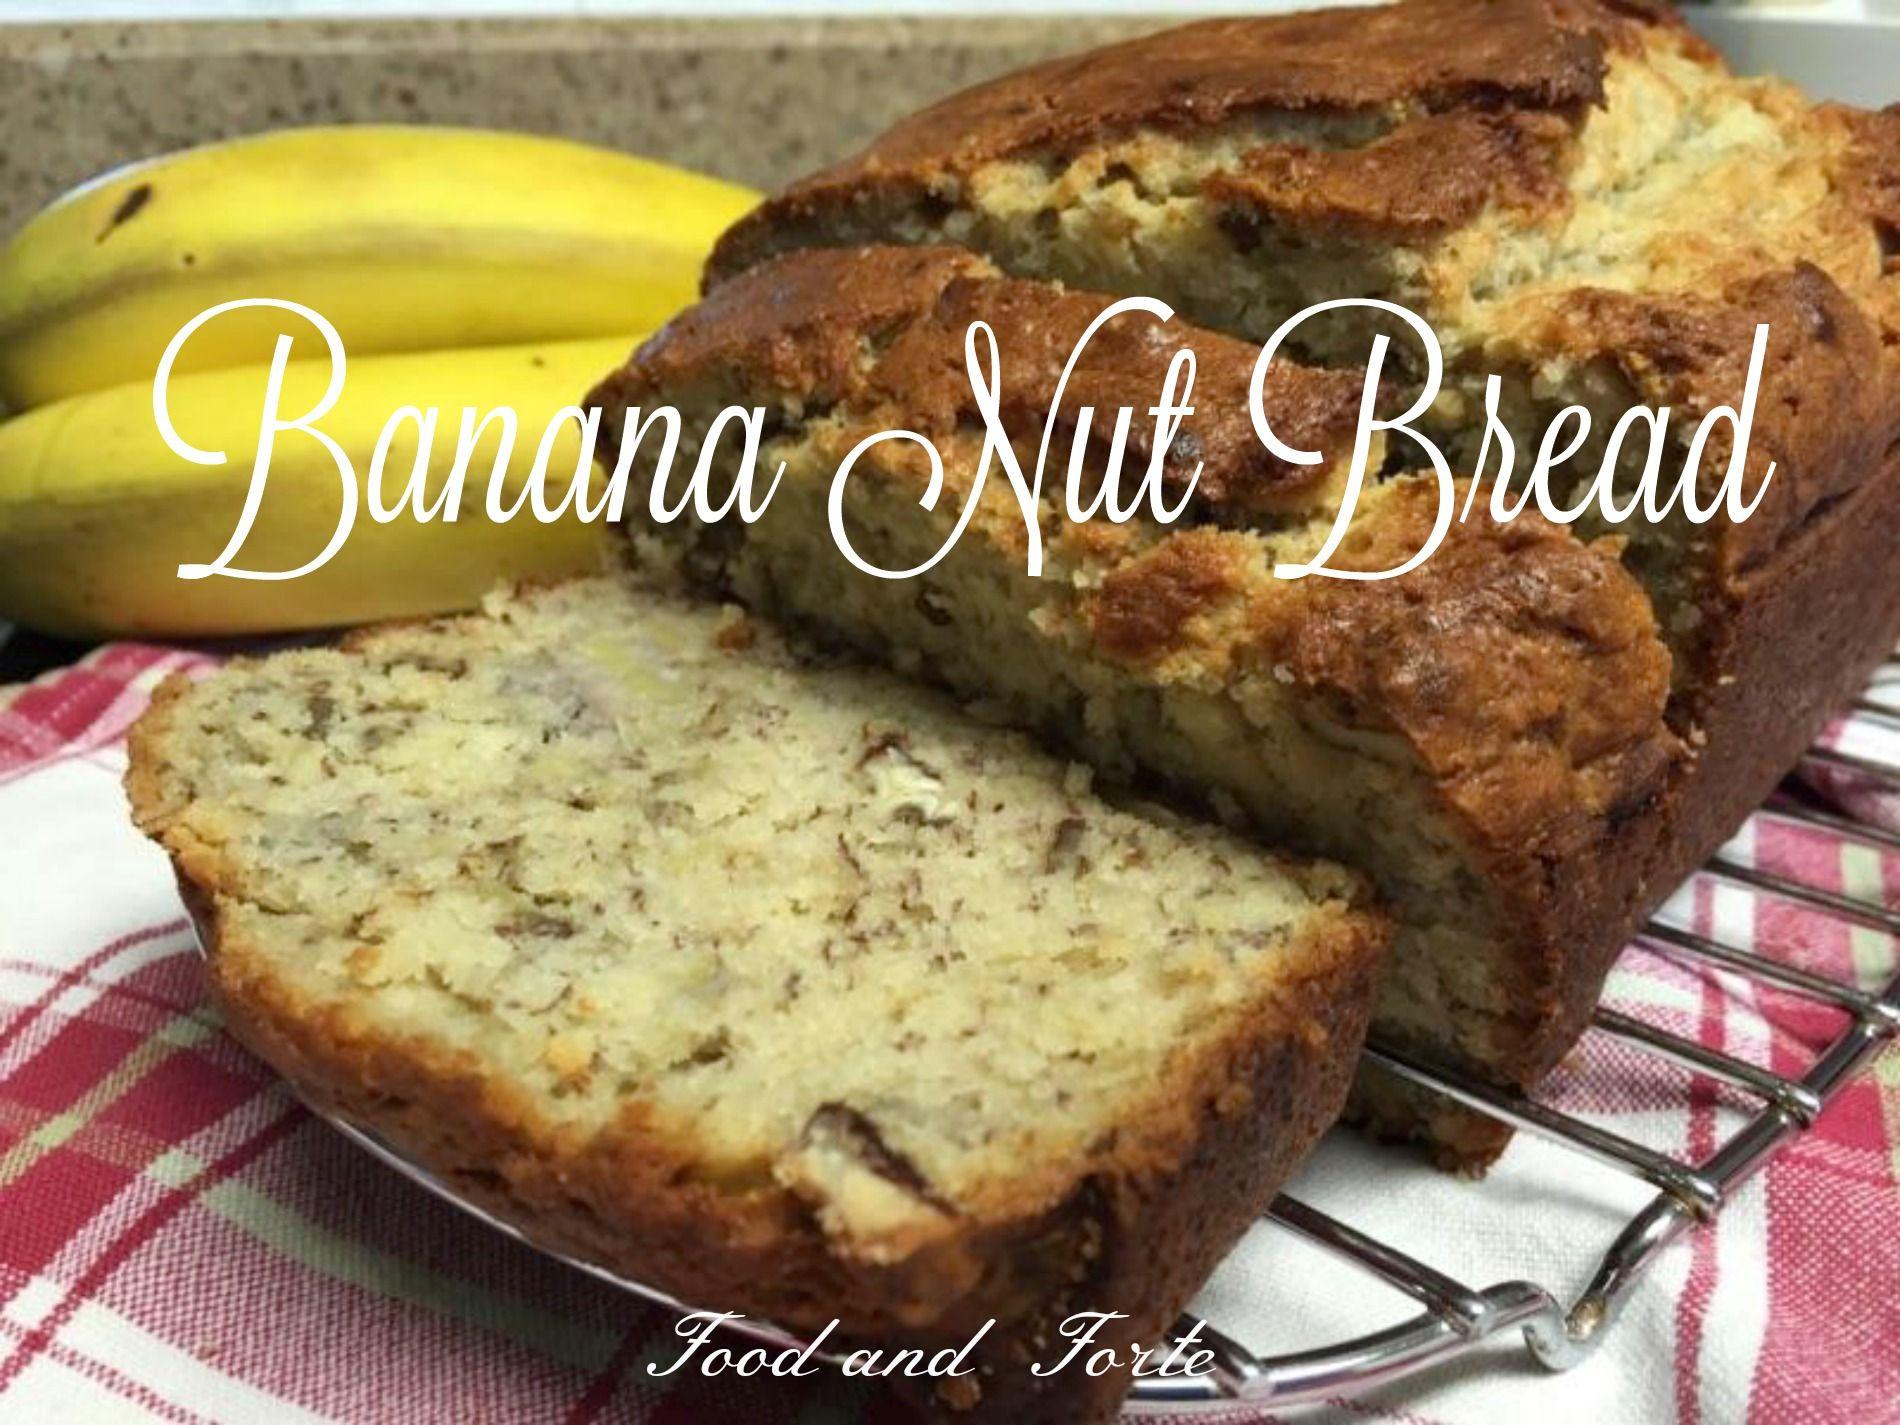 Banana Nut Bread Paula Deen Style Food And Forte Banana Nut Bread Paula Deen Banana Bread Food